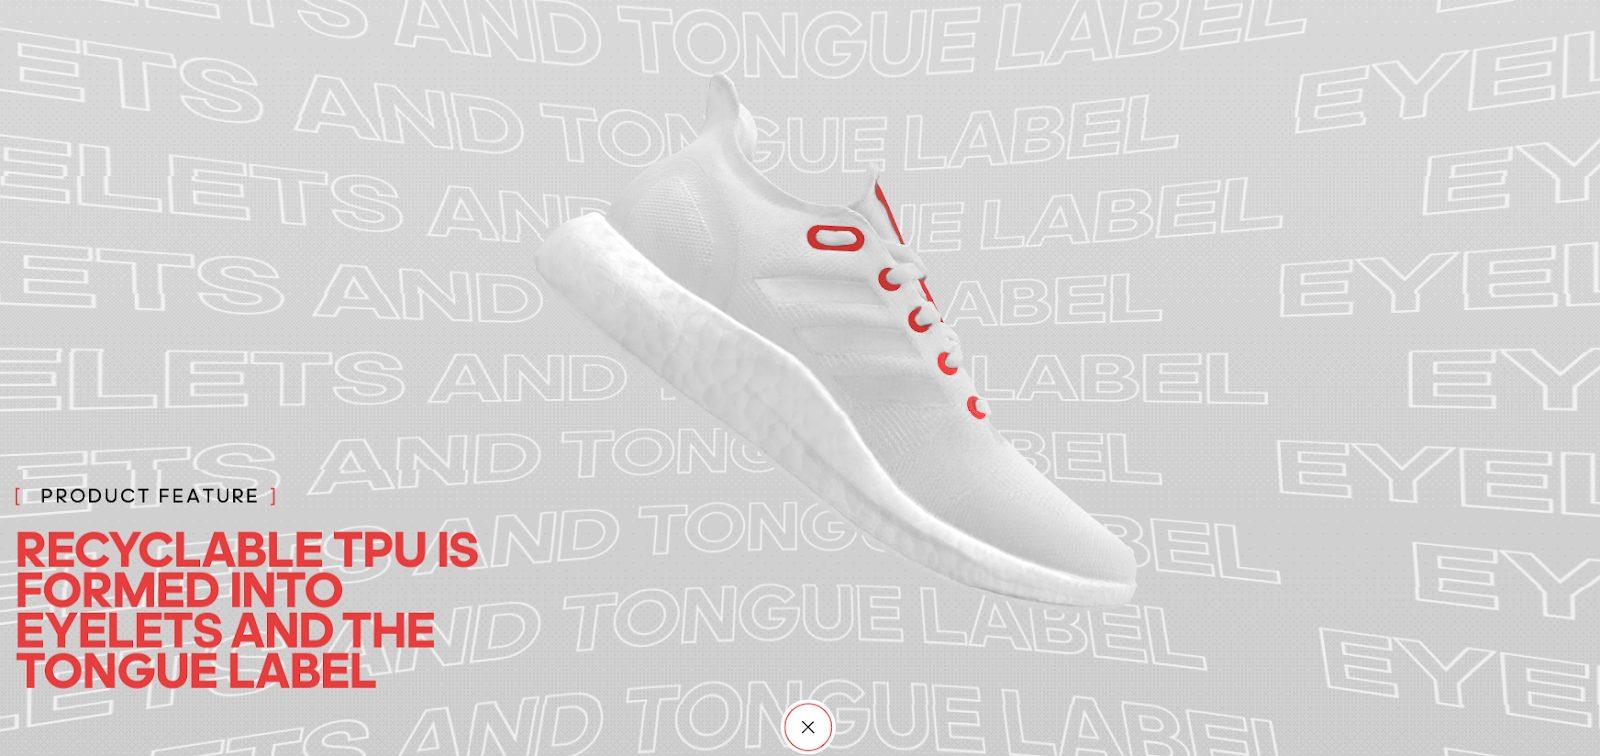 Adidas using 3D modeling